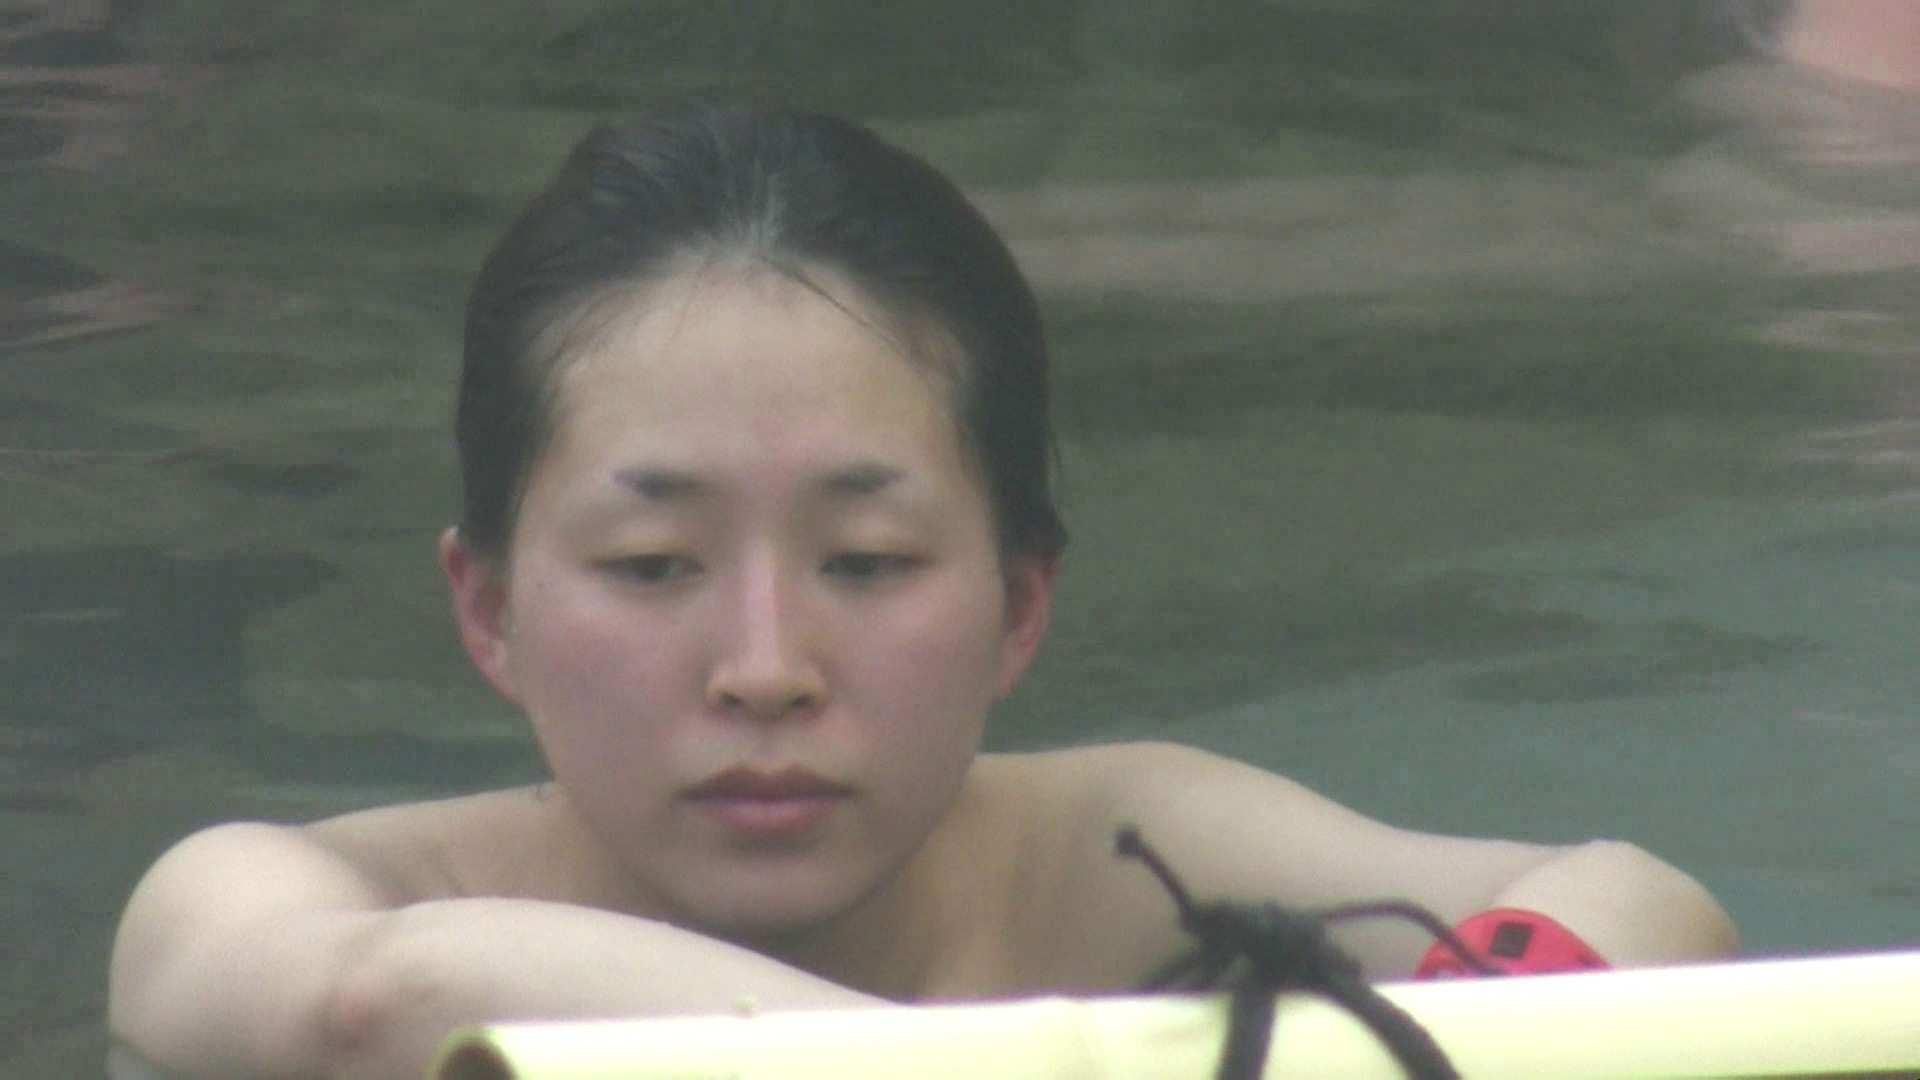 Aquaな露天風呂Vol.583 美しいOLの裸体 すけべAV動画紹介 103pic 62